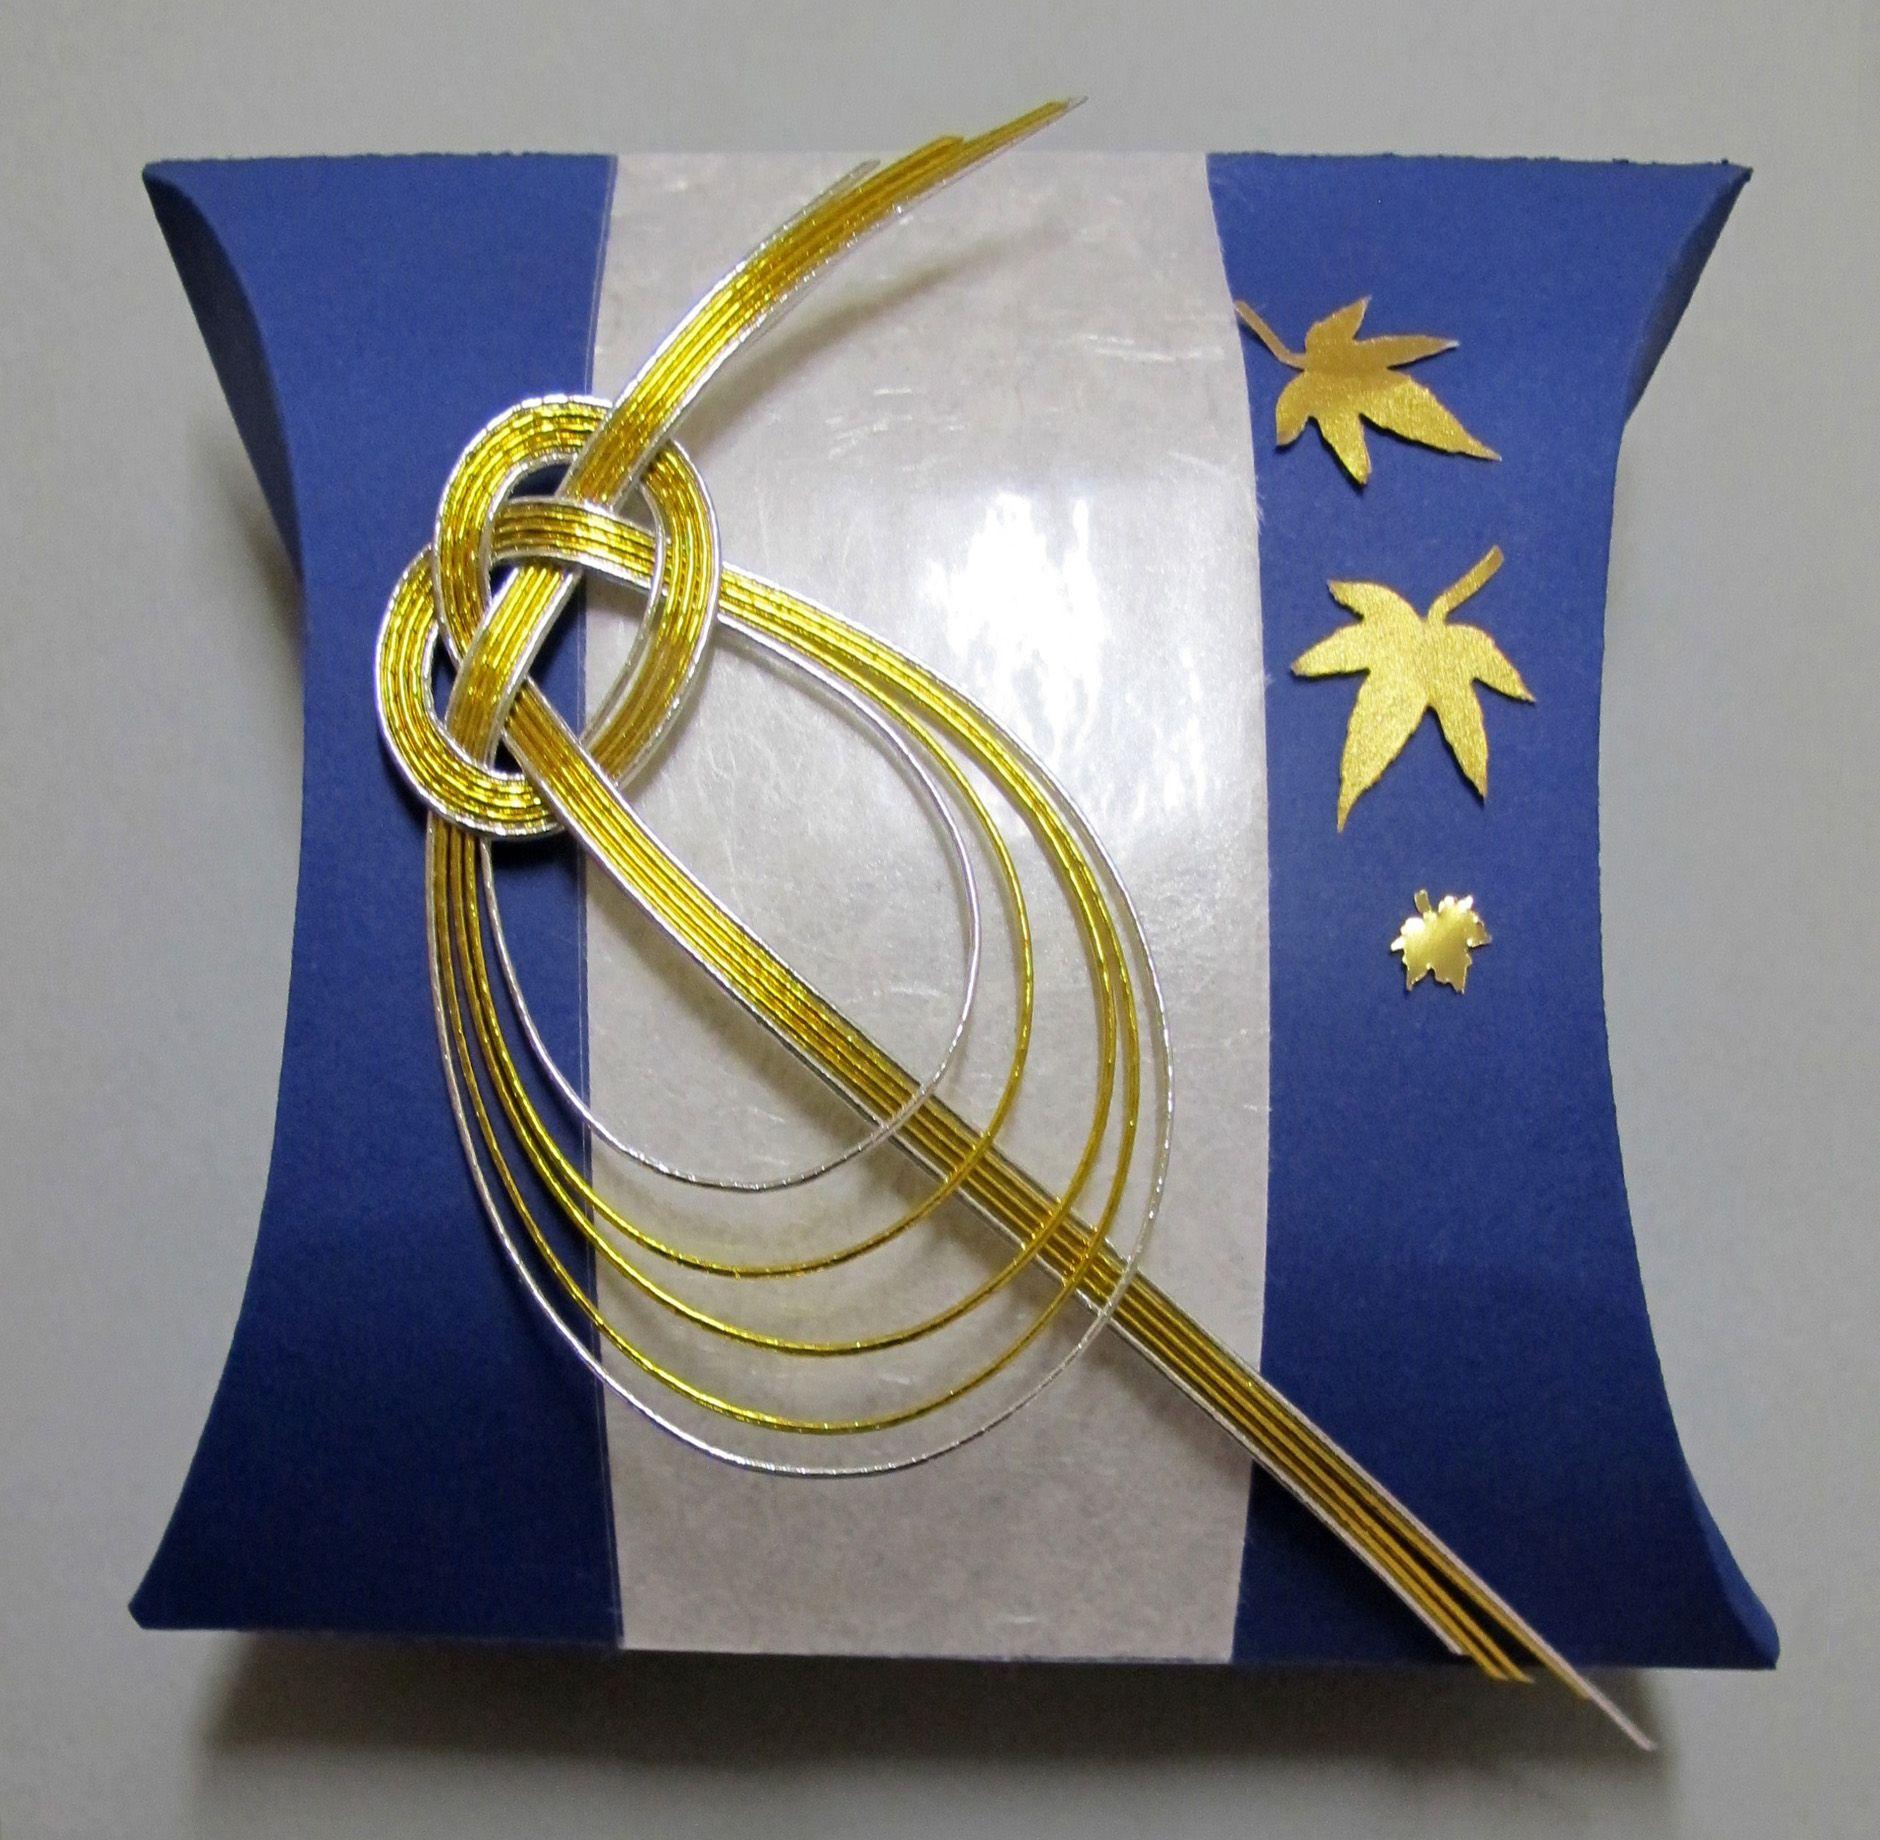 Gift pillow using mizuhiki mizuhiki pinterest gift asian gift pillow using mizuhiki negle Gallery